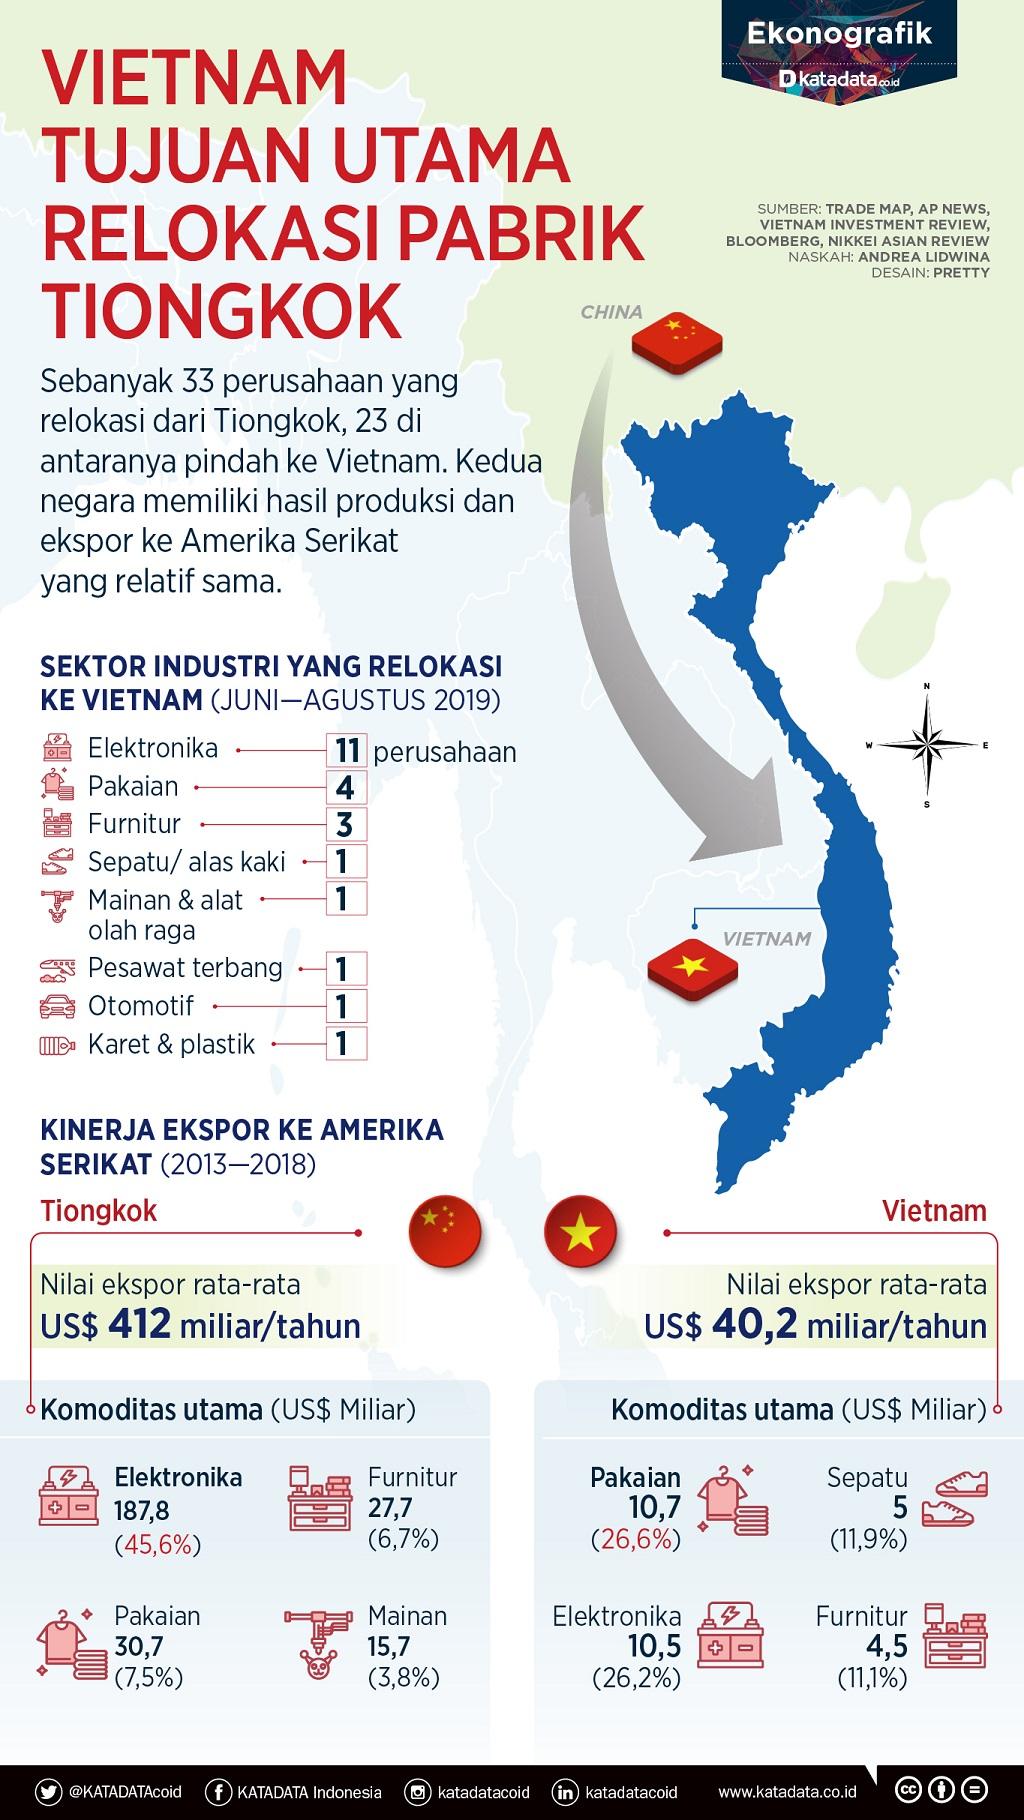 Vietnam tujuan utama relokasi pabrik tiongkok